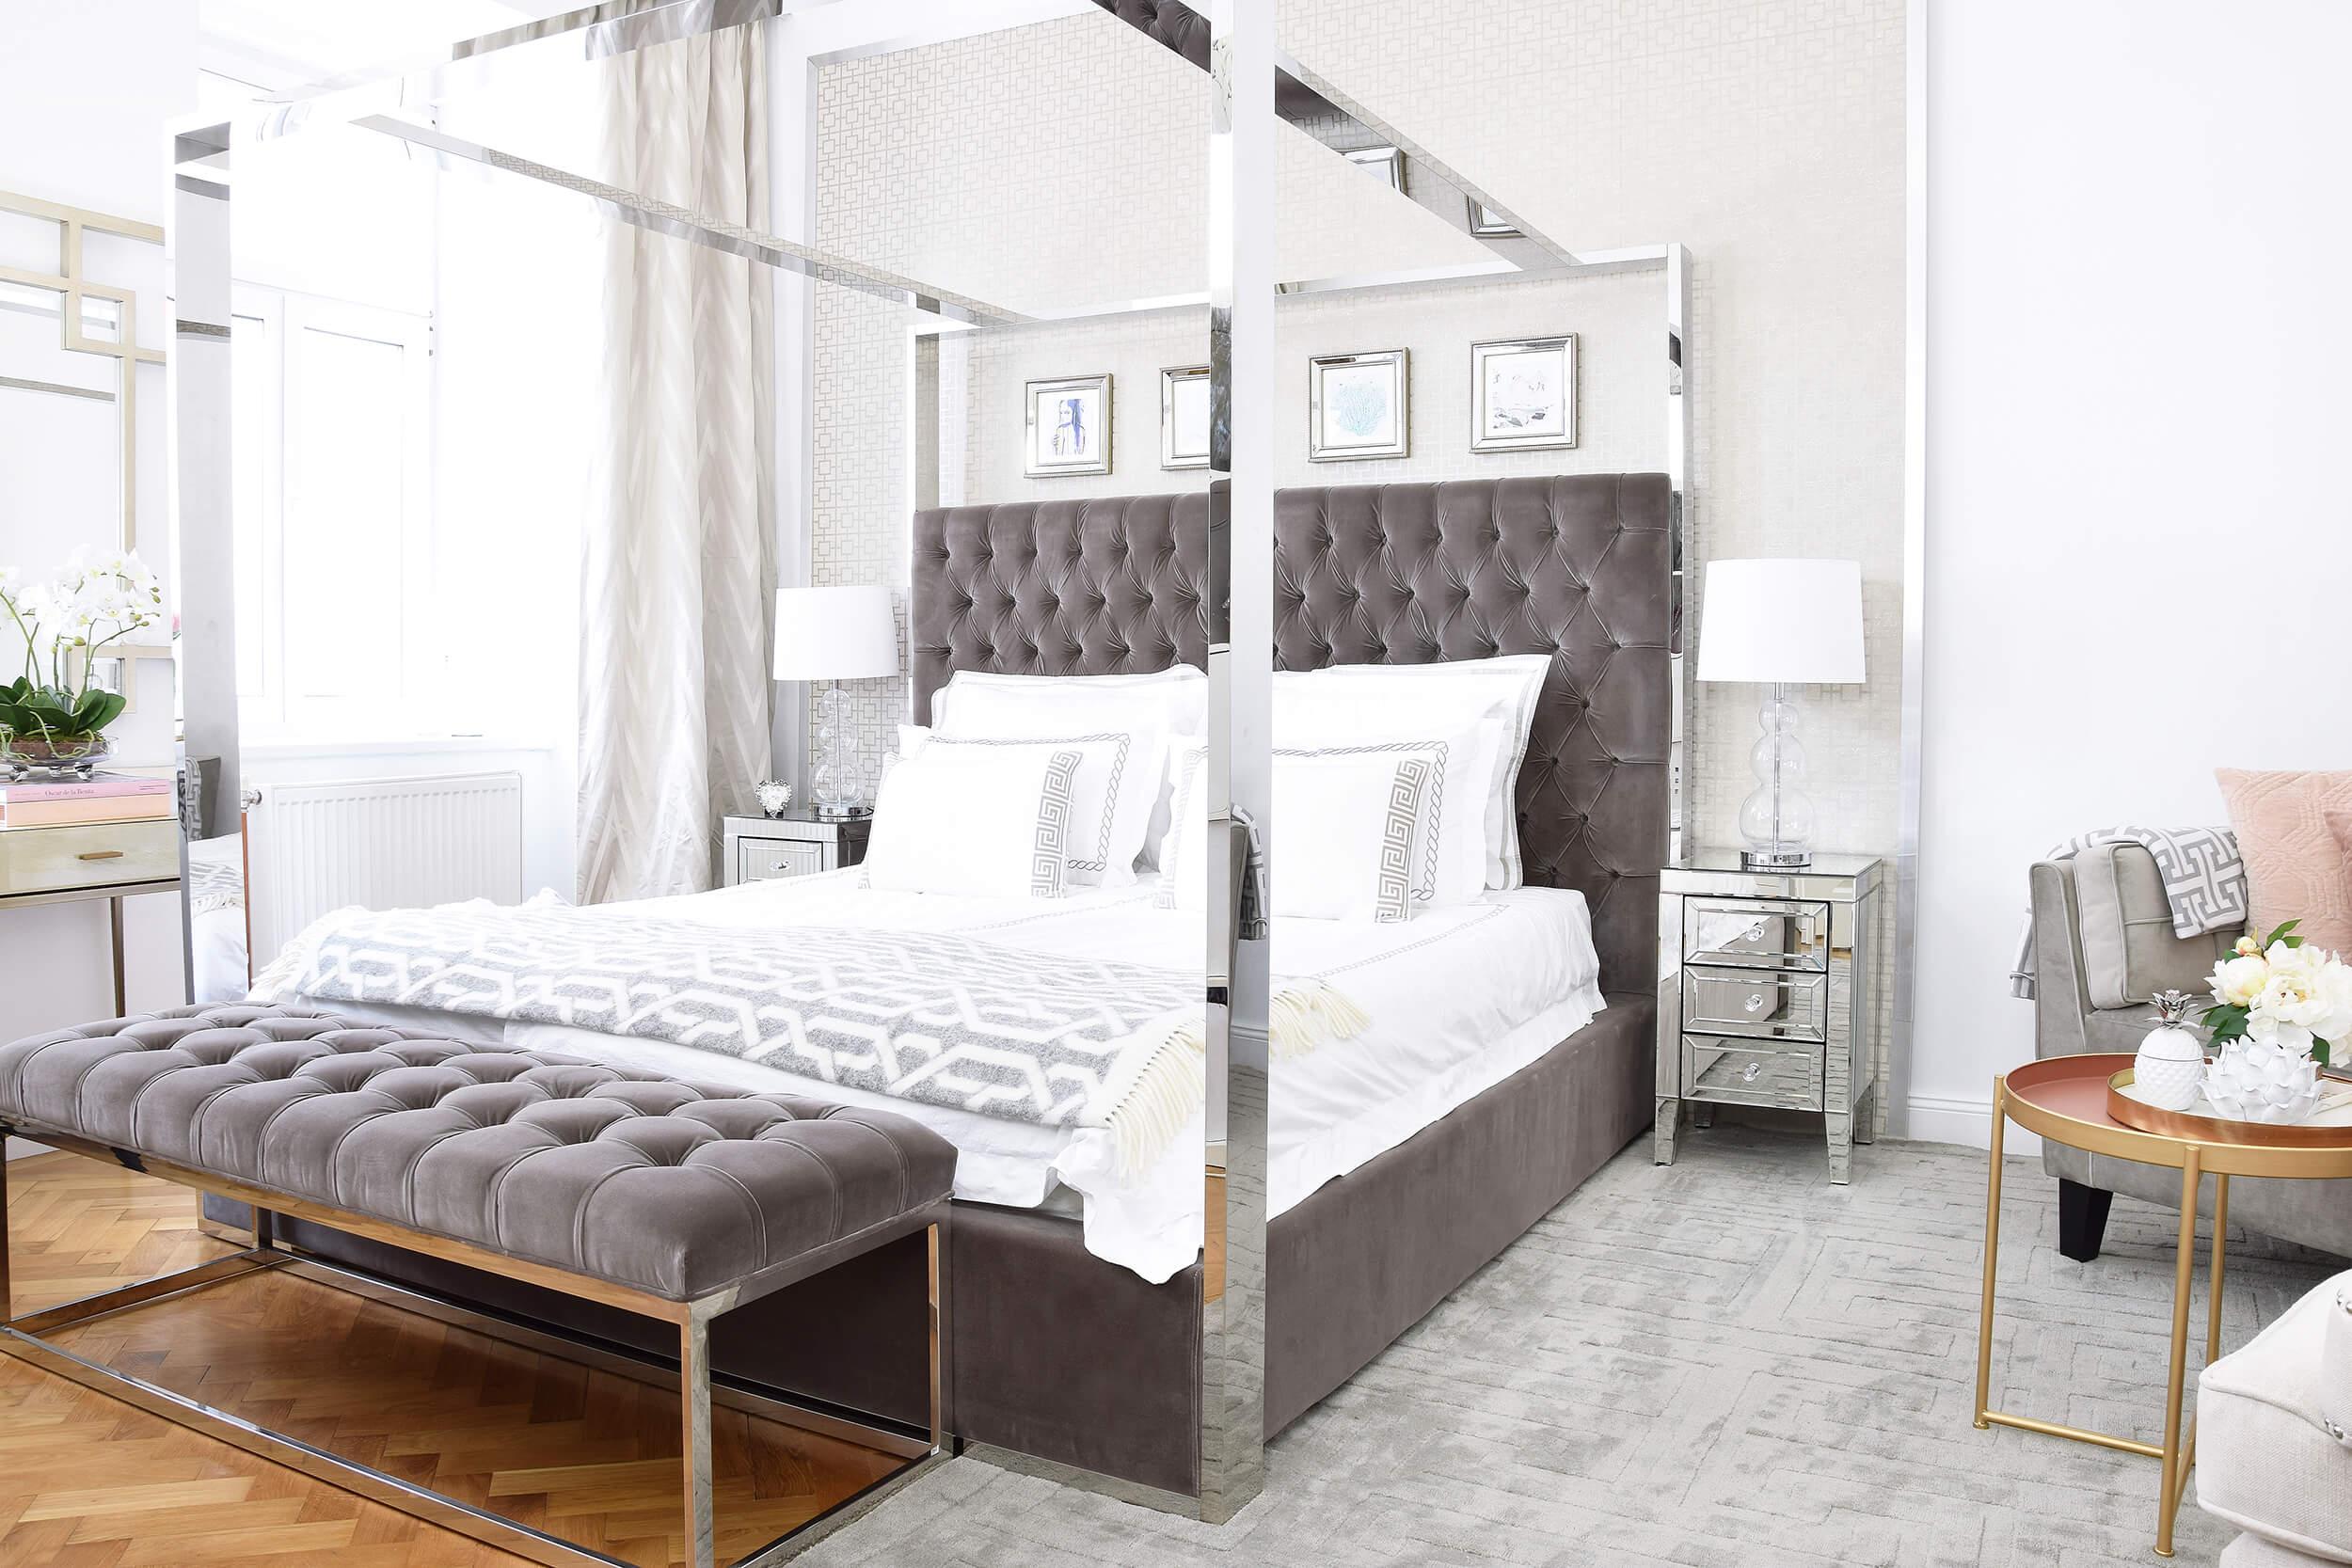 Homestory - Christianes Traum-Schlafzimmer